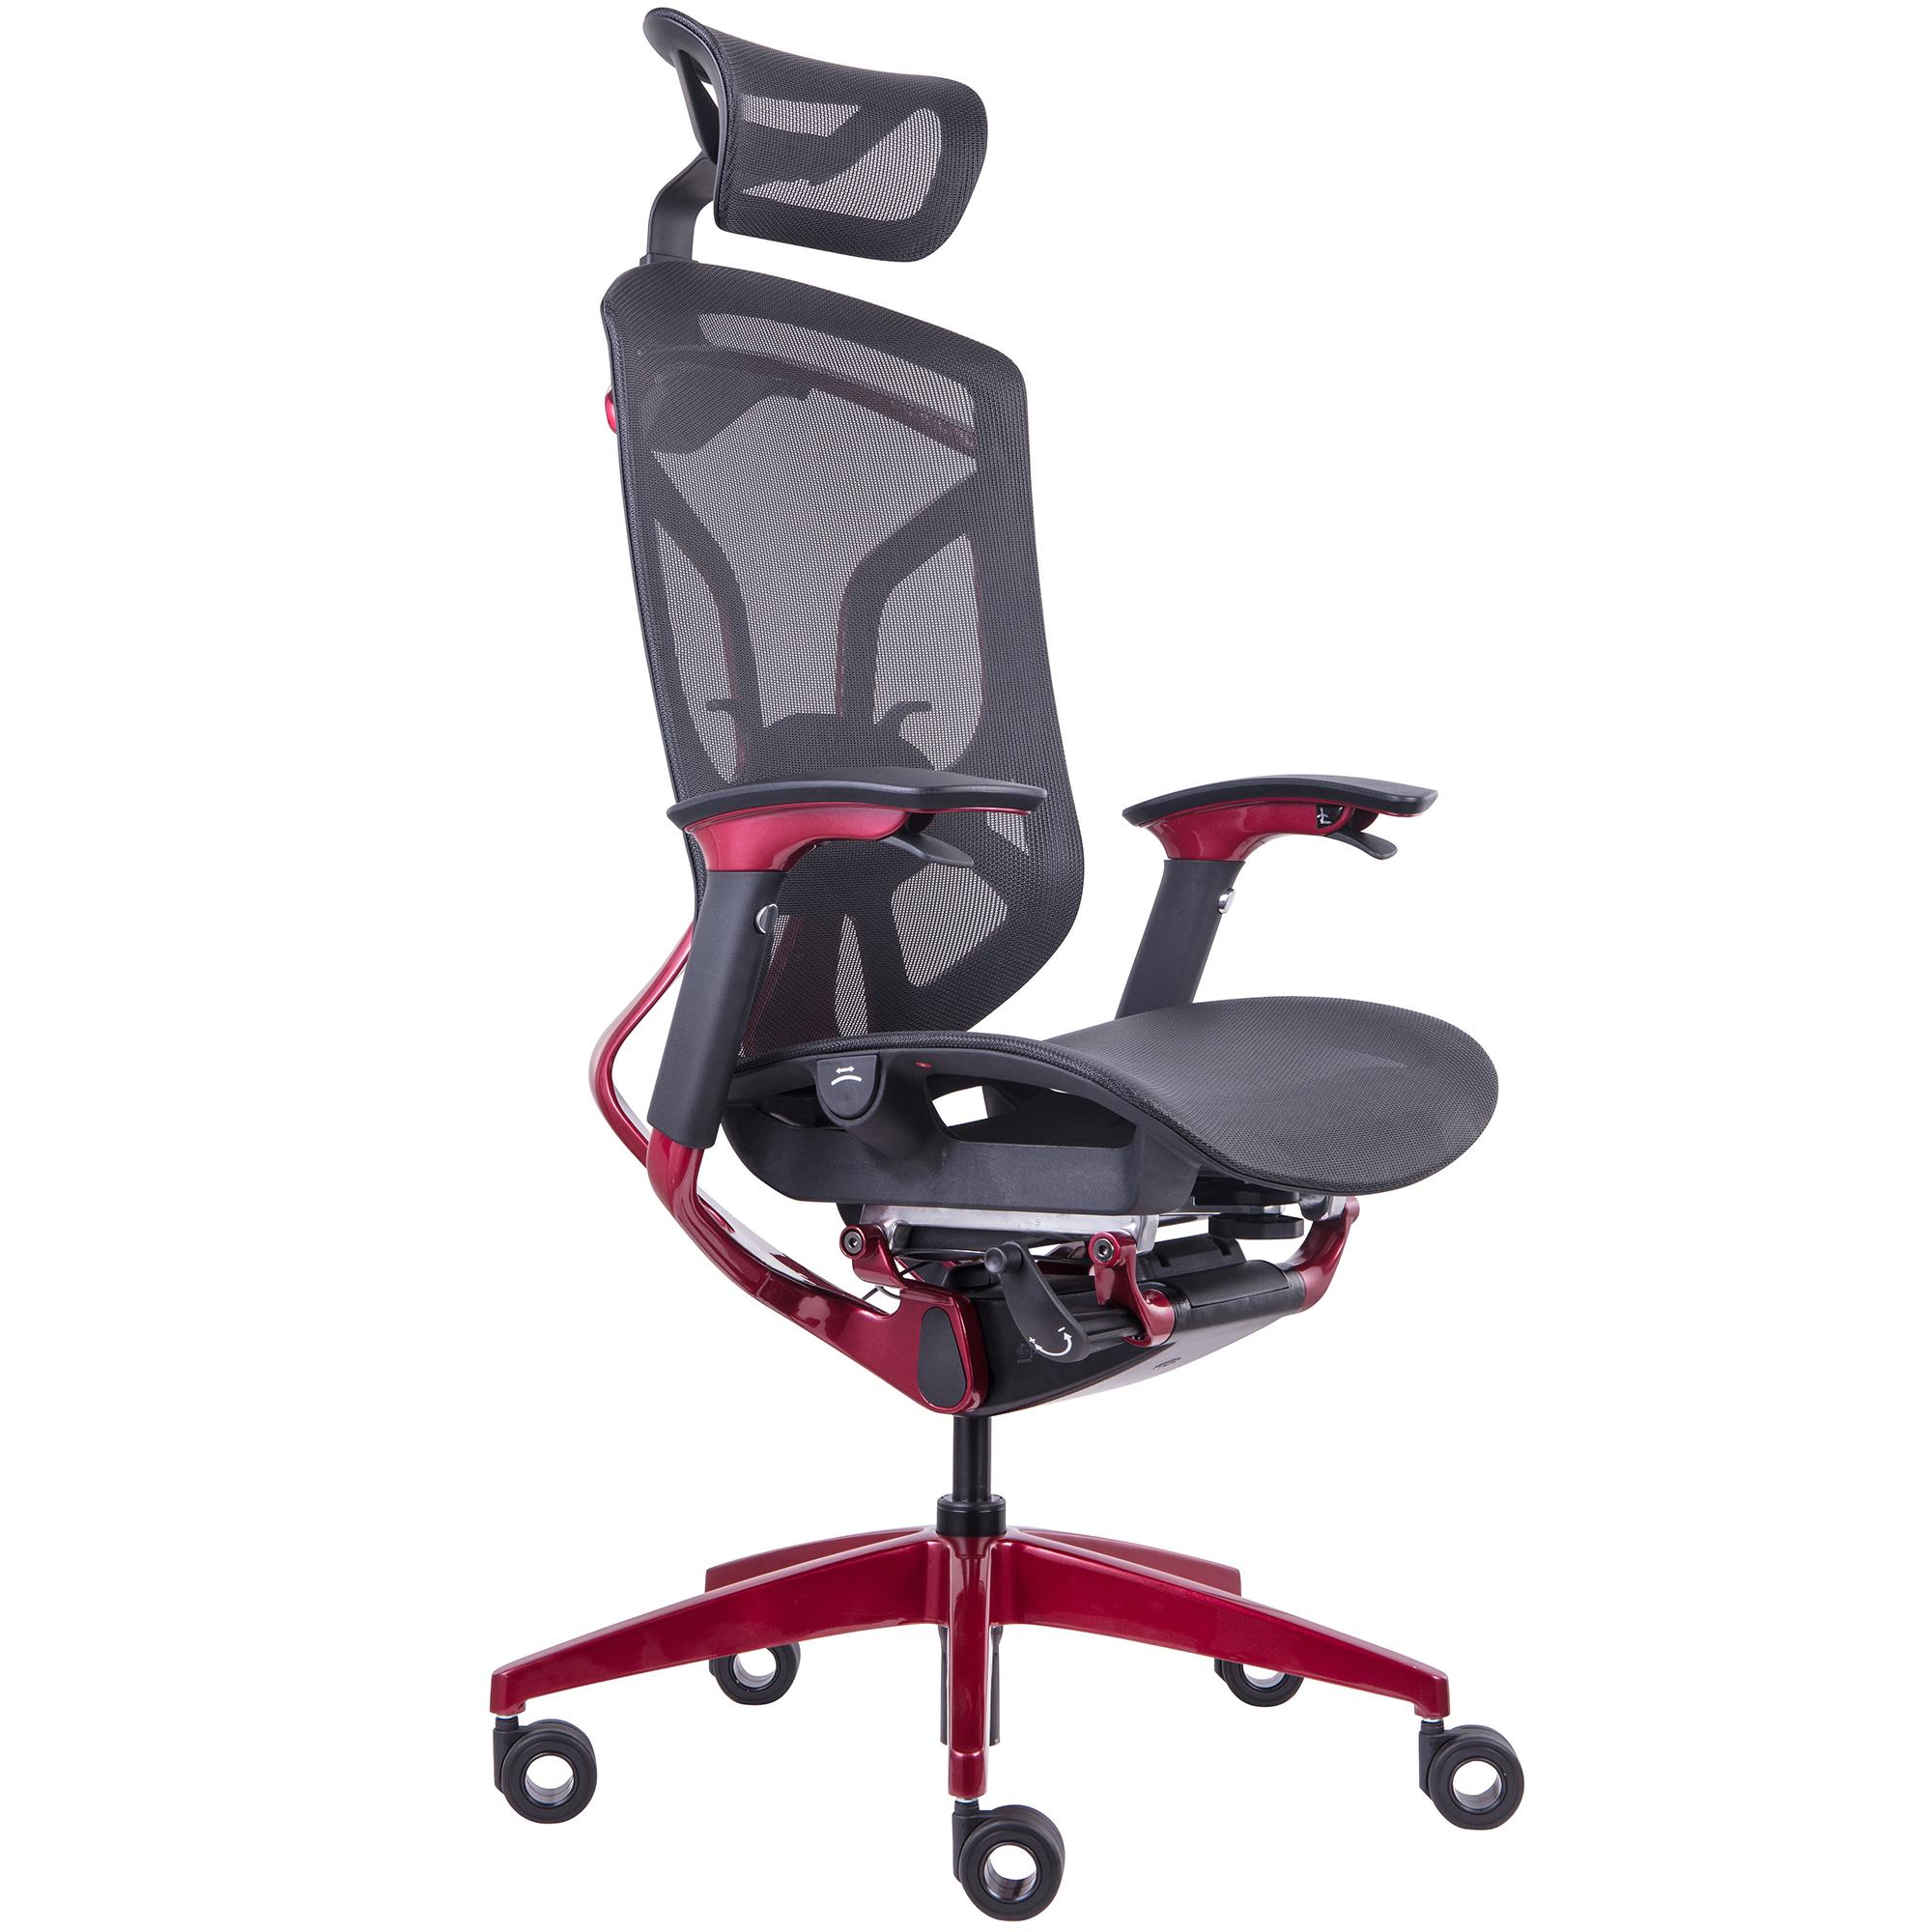 Pace Gtchair Dv 10e Ergonomic Gaming Chair